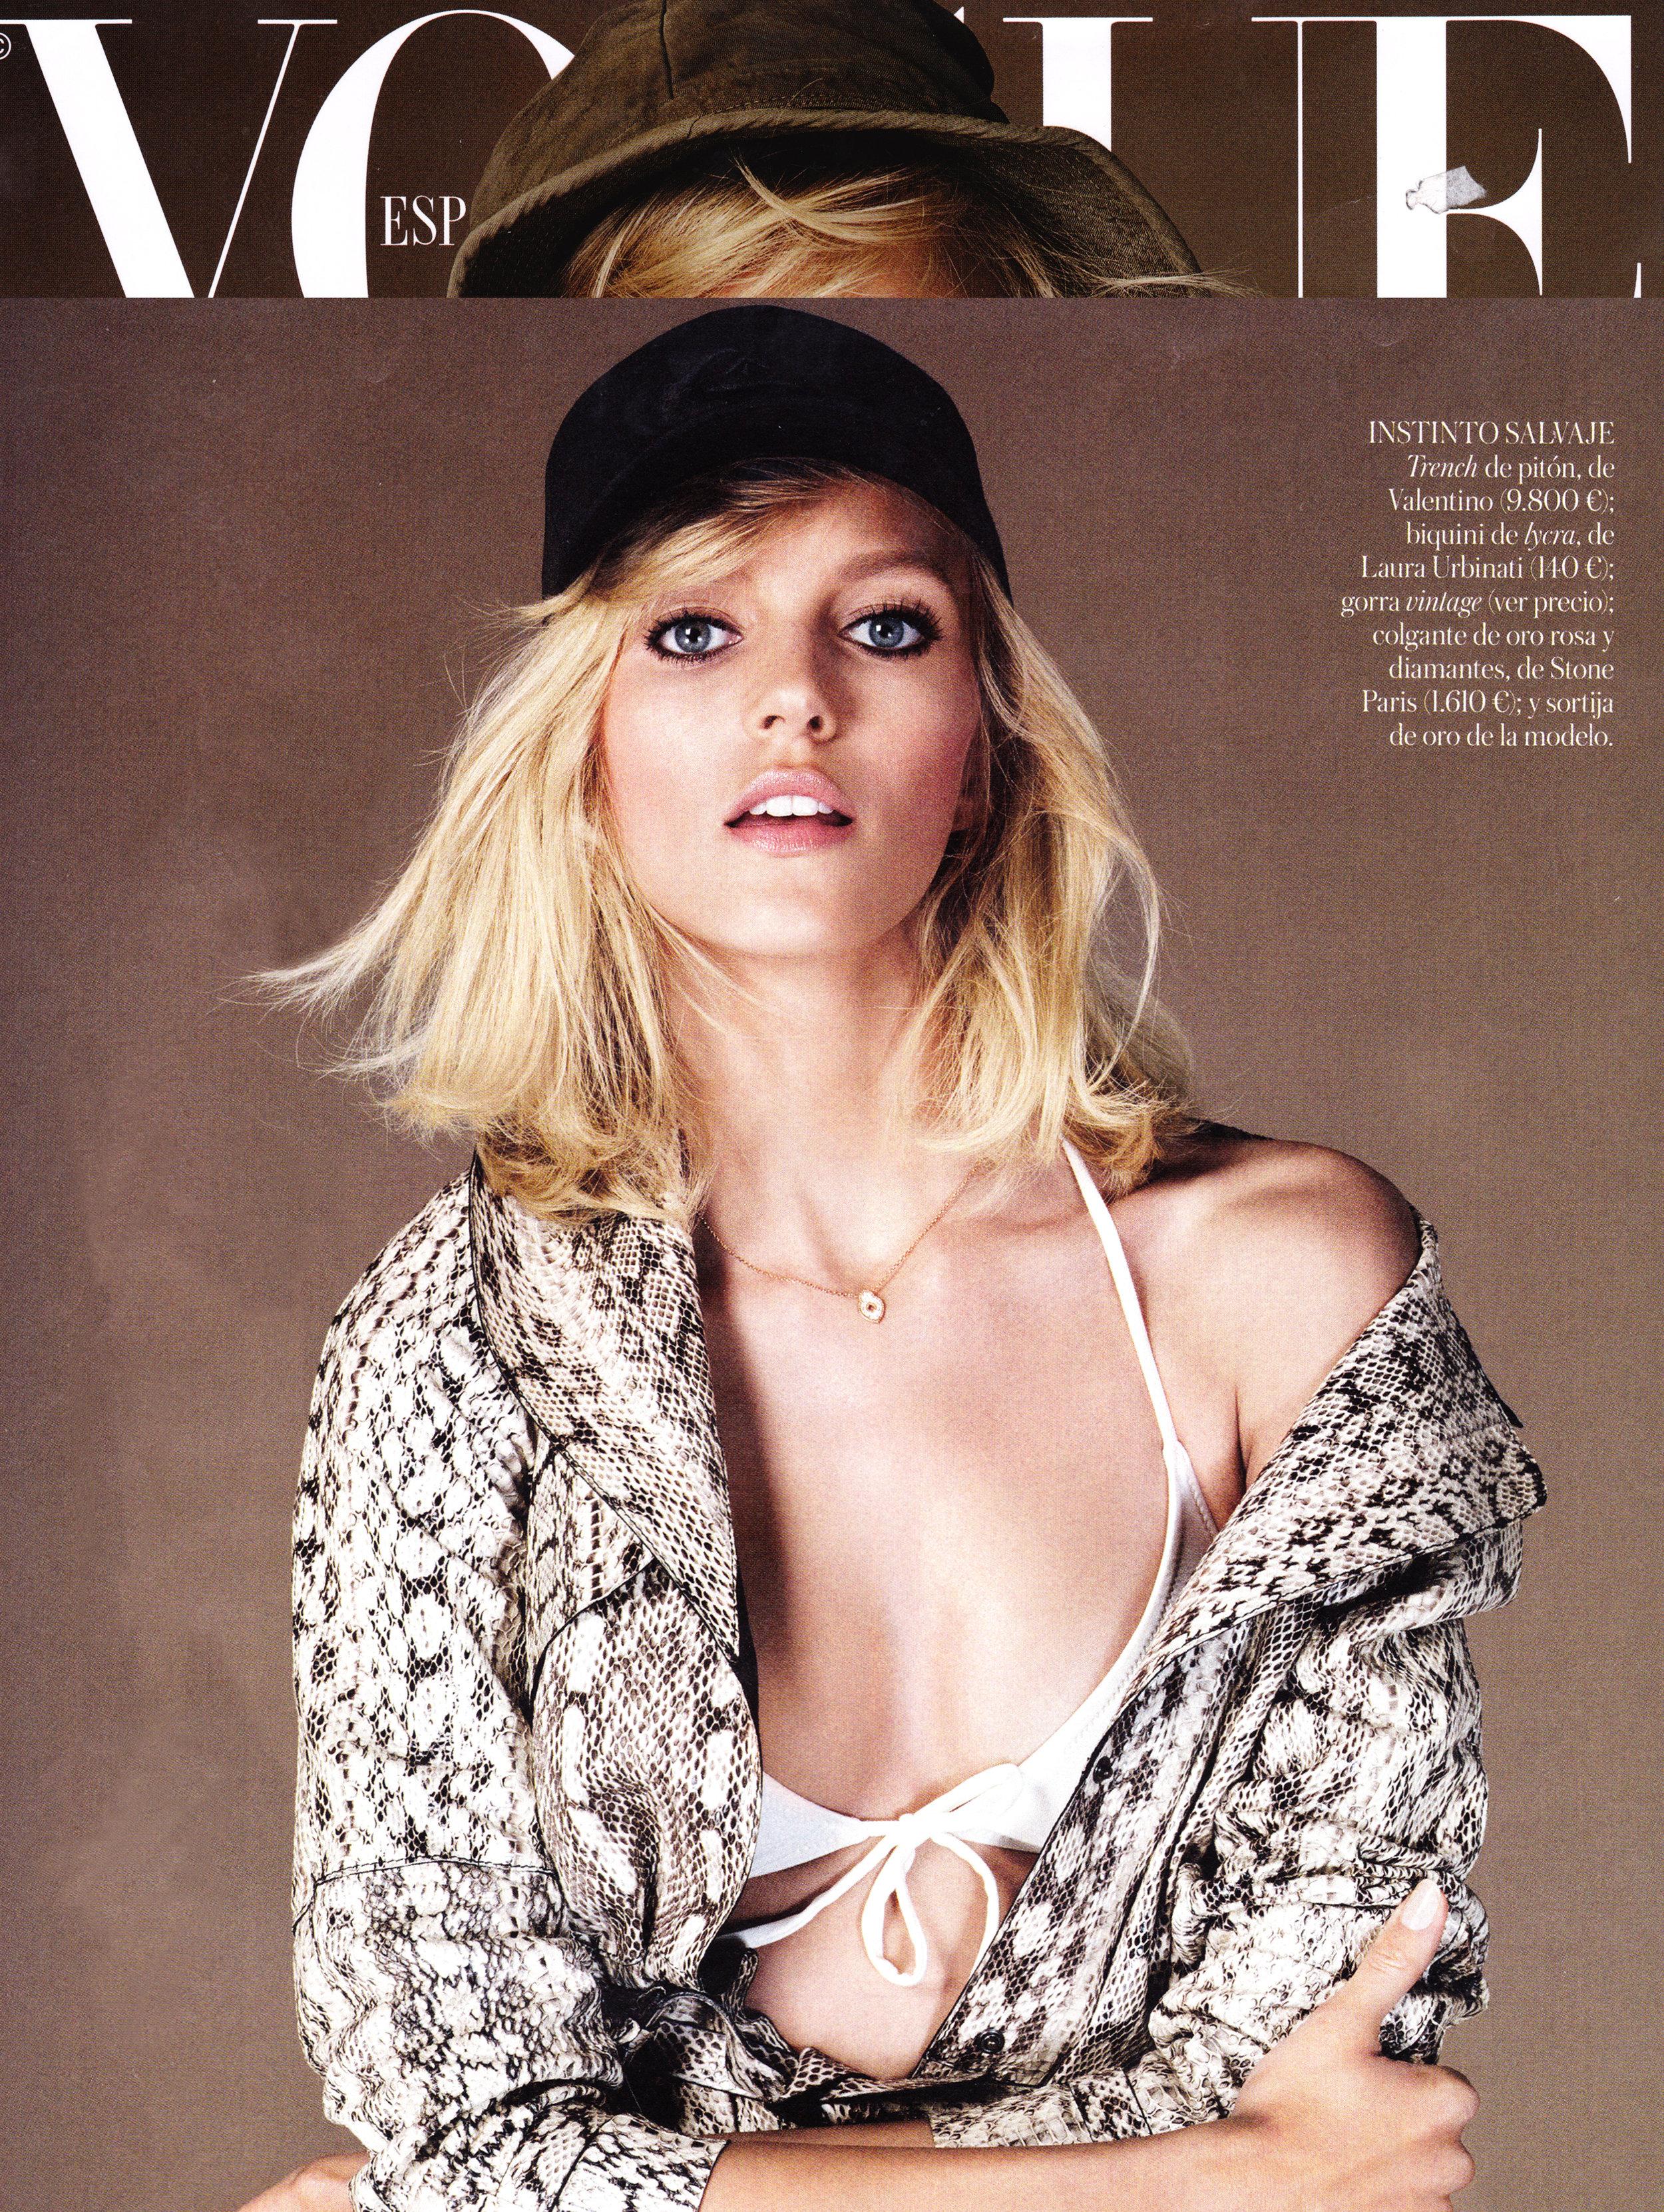 Anja Rubik - Vogue Spain 2013